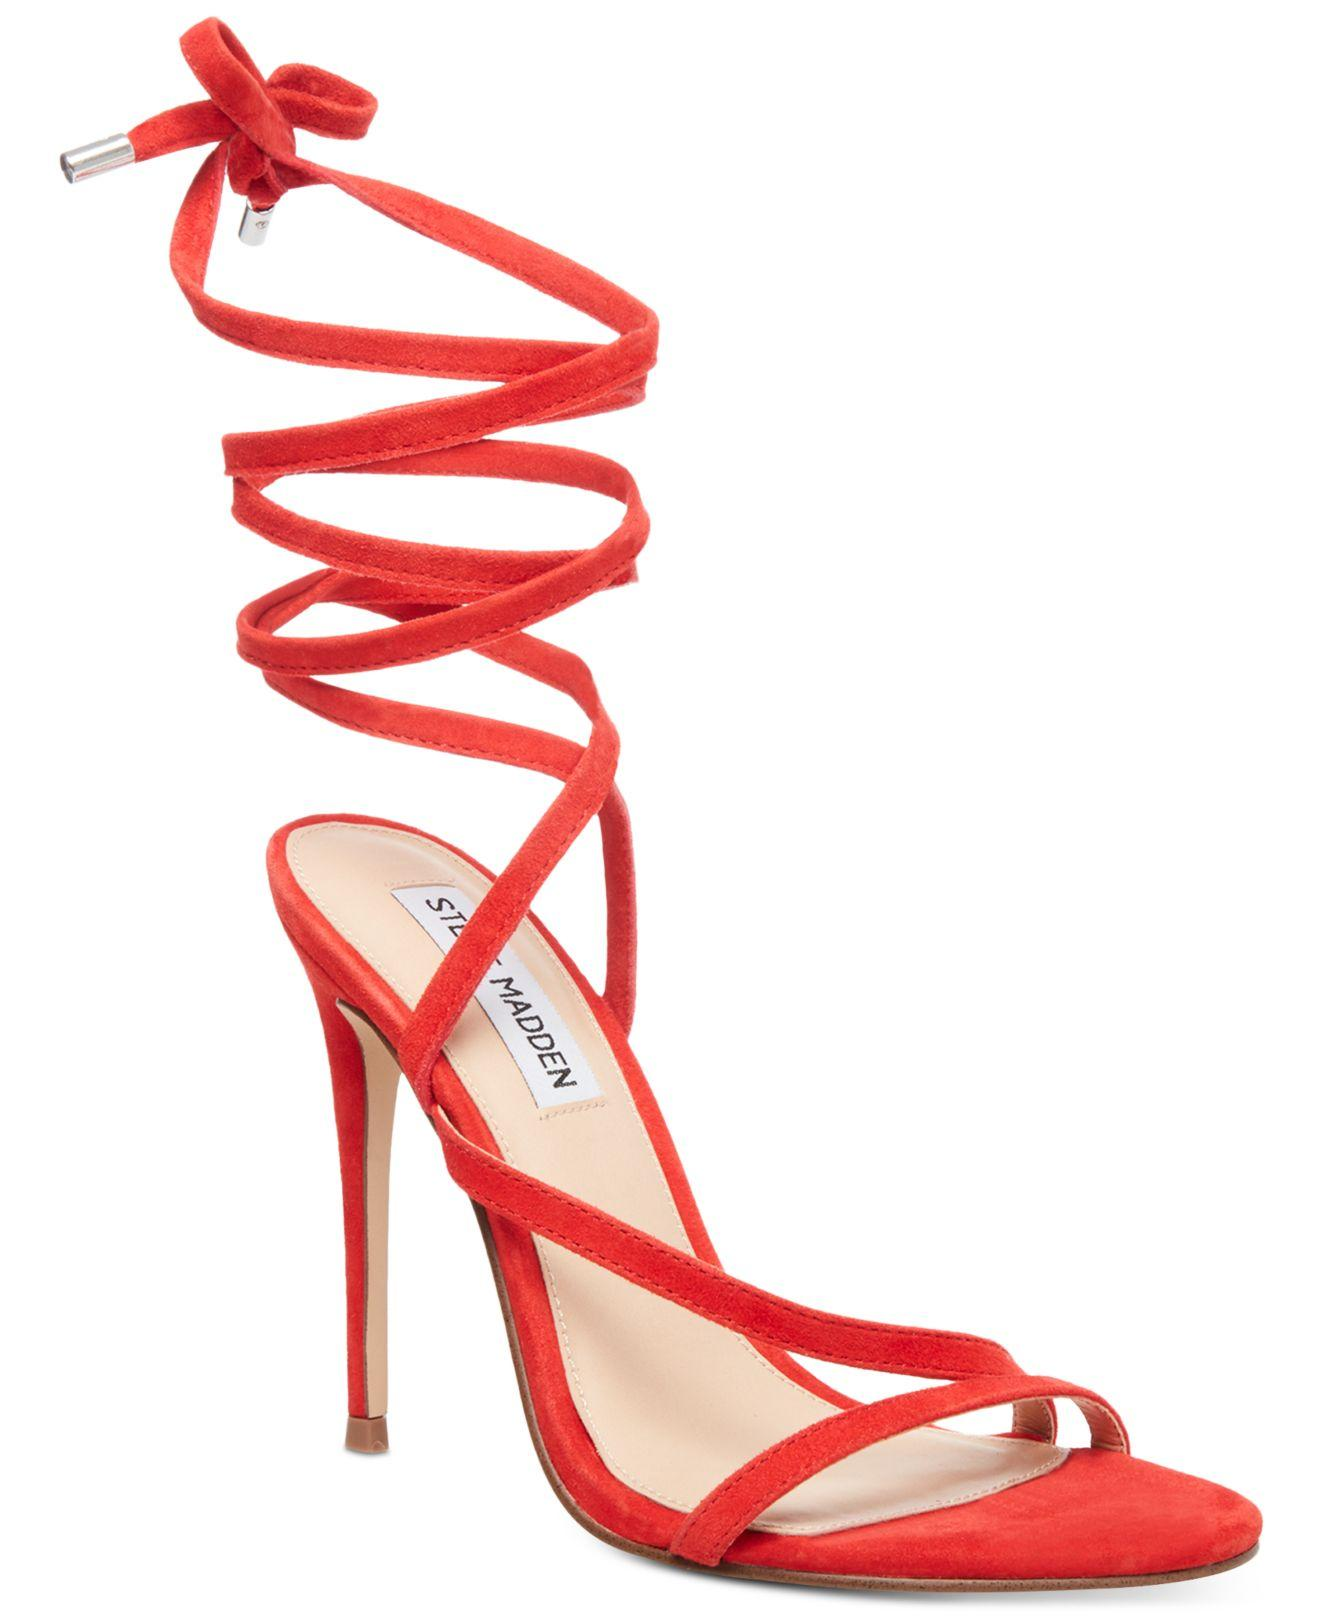 fb4fe75b6b89 Lyst - Steve Madden Amberlyn Tie-up Dress Sandals in Red